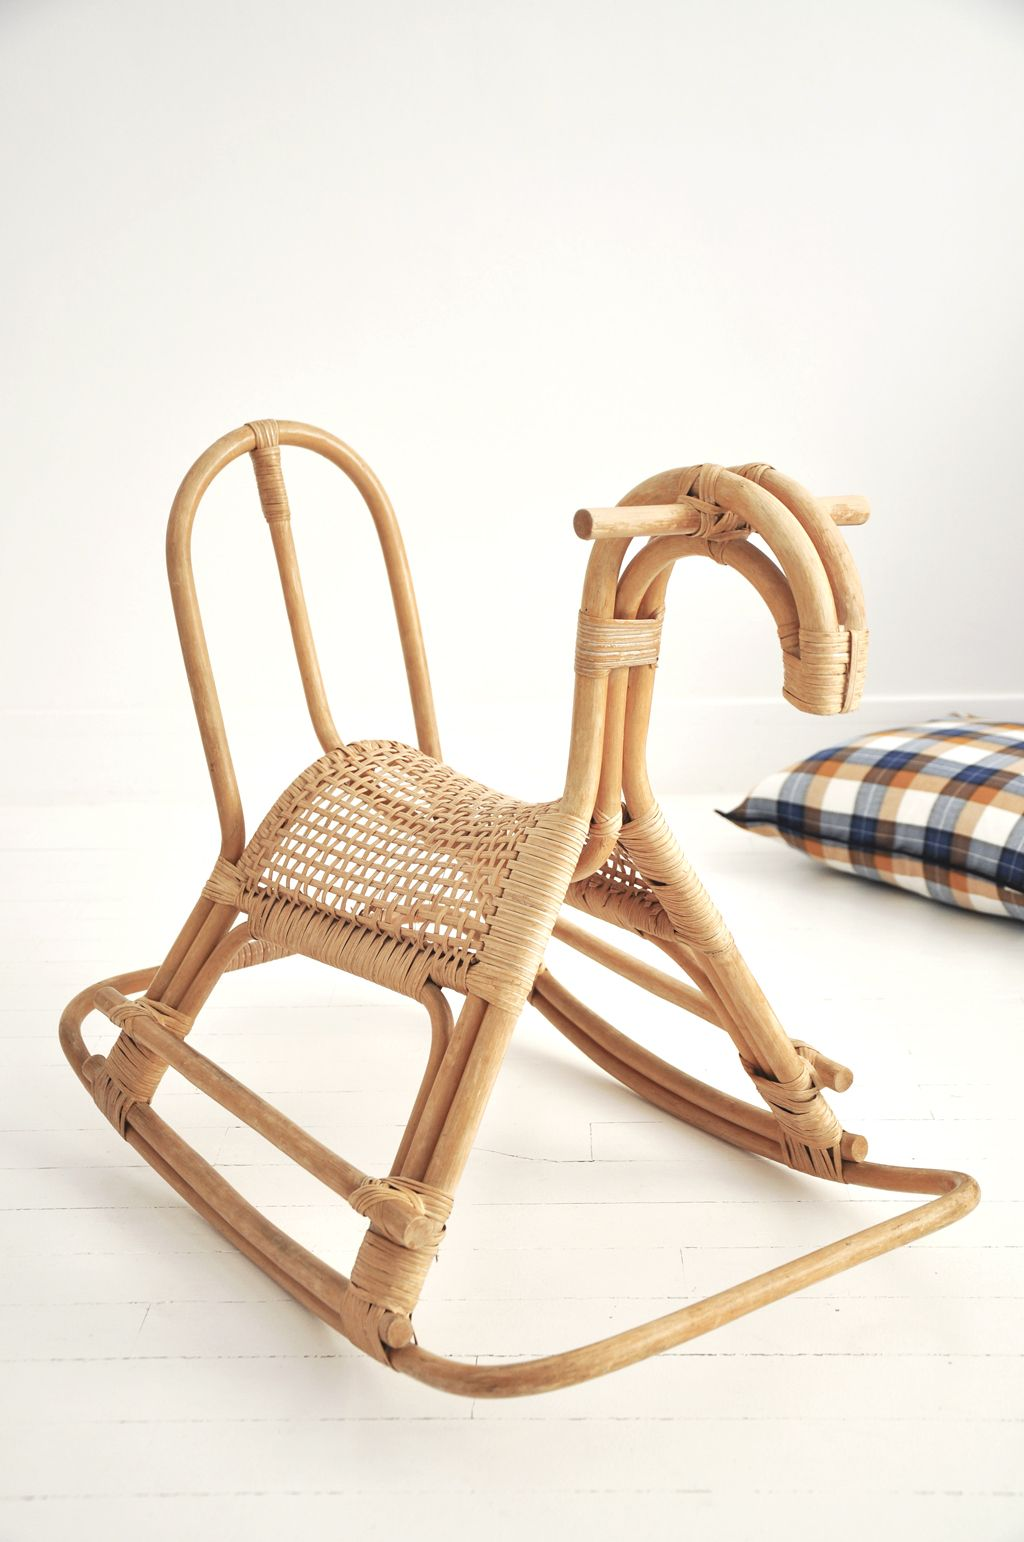 cheval bascule rotin jouet enfant mobilier vintage. Black Bedroom Furniture Sets. Home Design Ideas